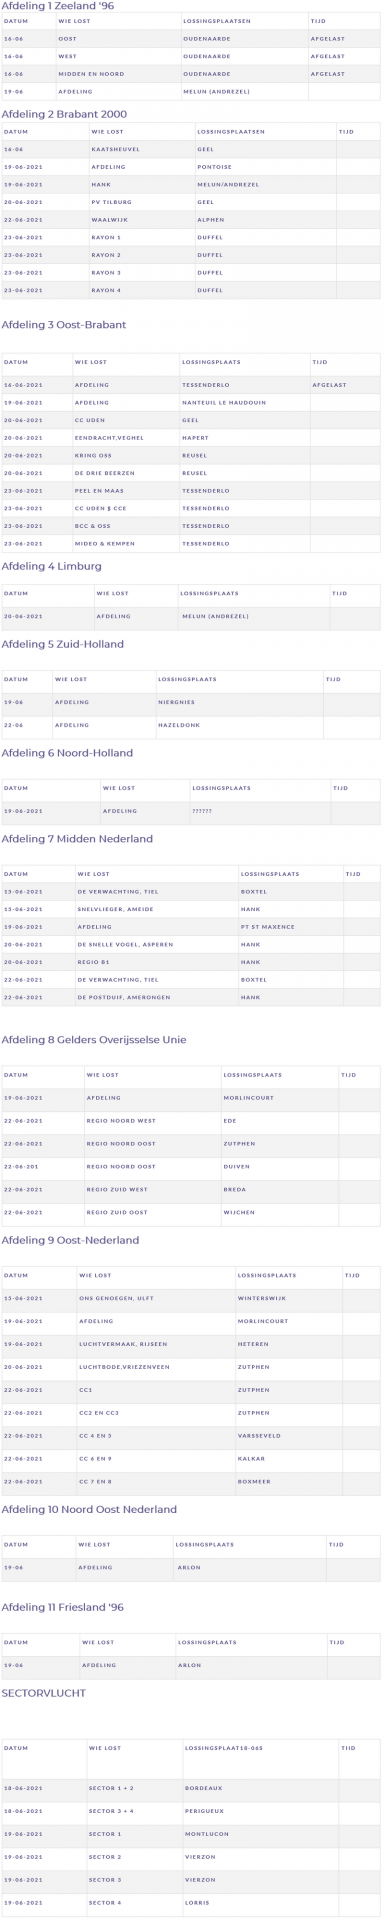 Screenshot 2021 06 15 at 08 25 11 wie lost waar en hoe laat duivensportbond